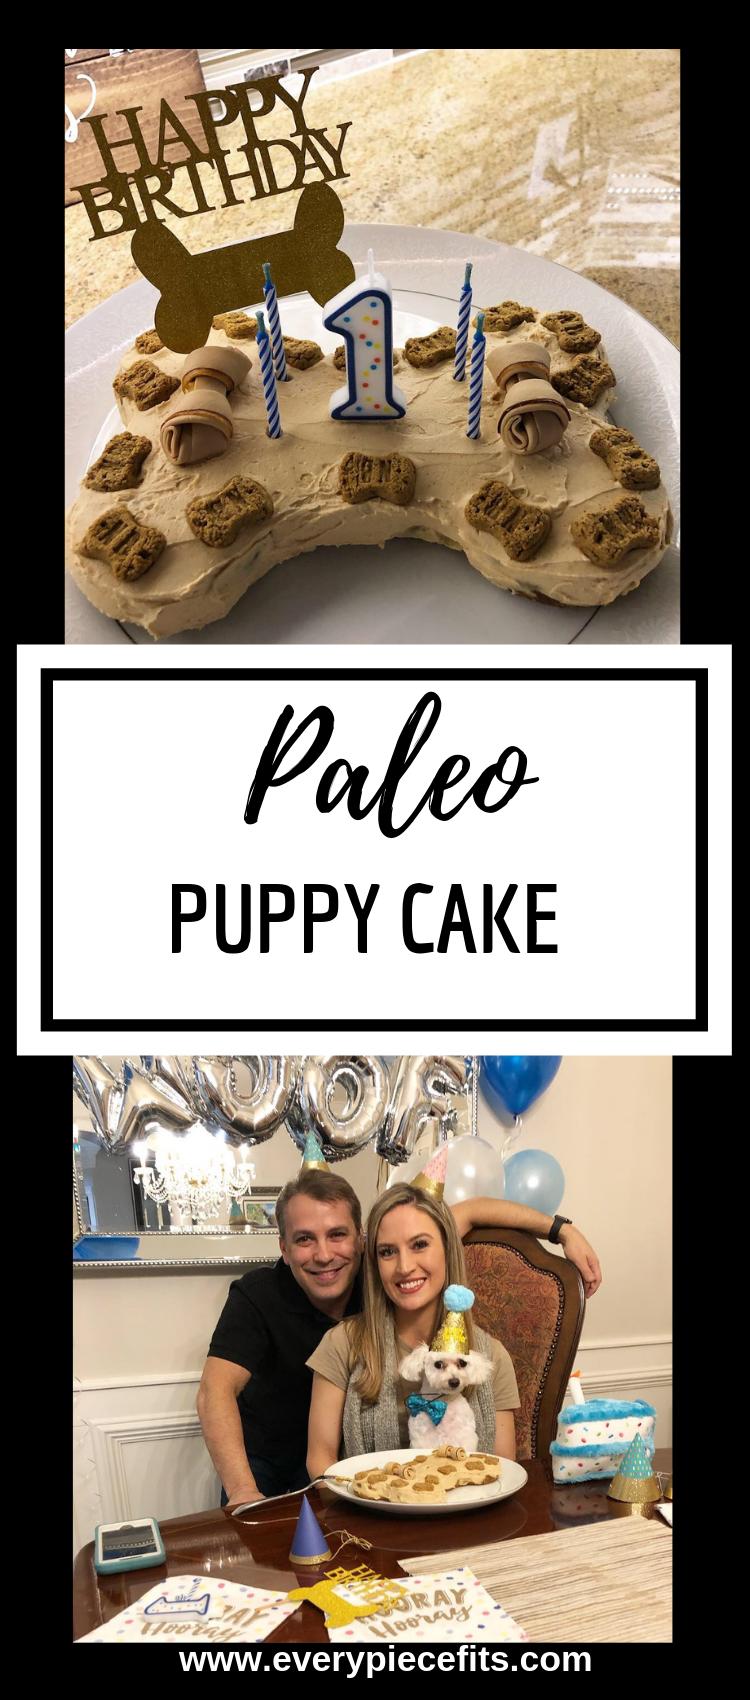 Paleo Puppy Cake.png